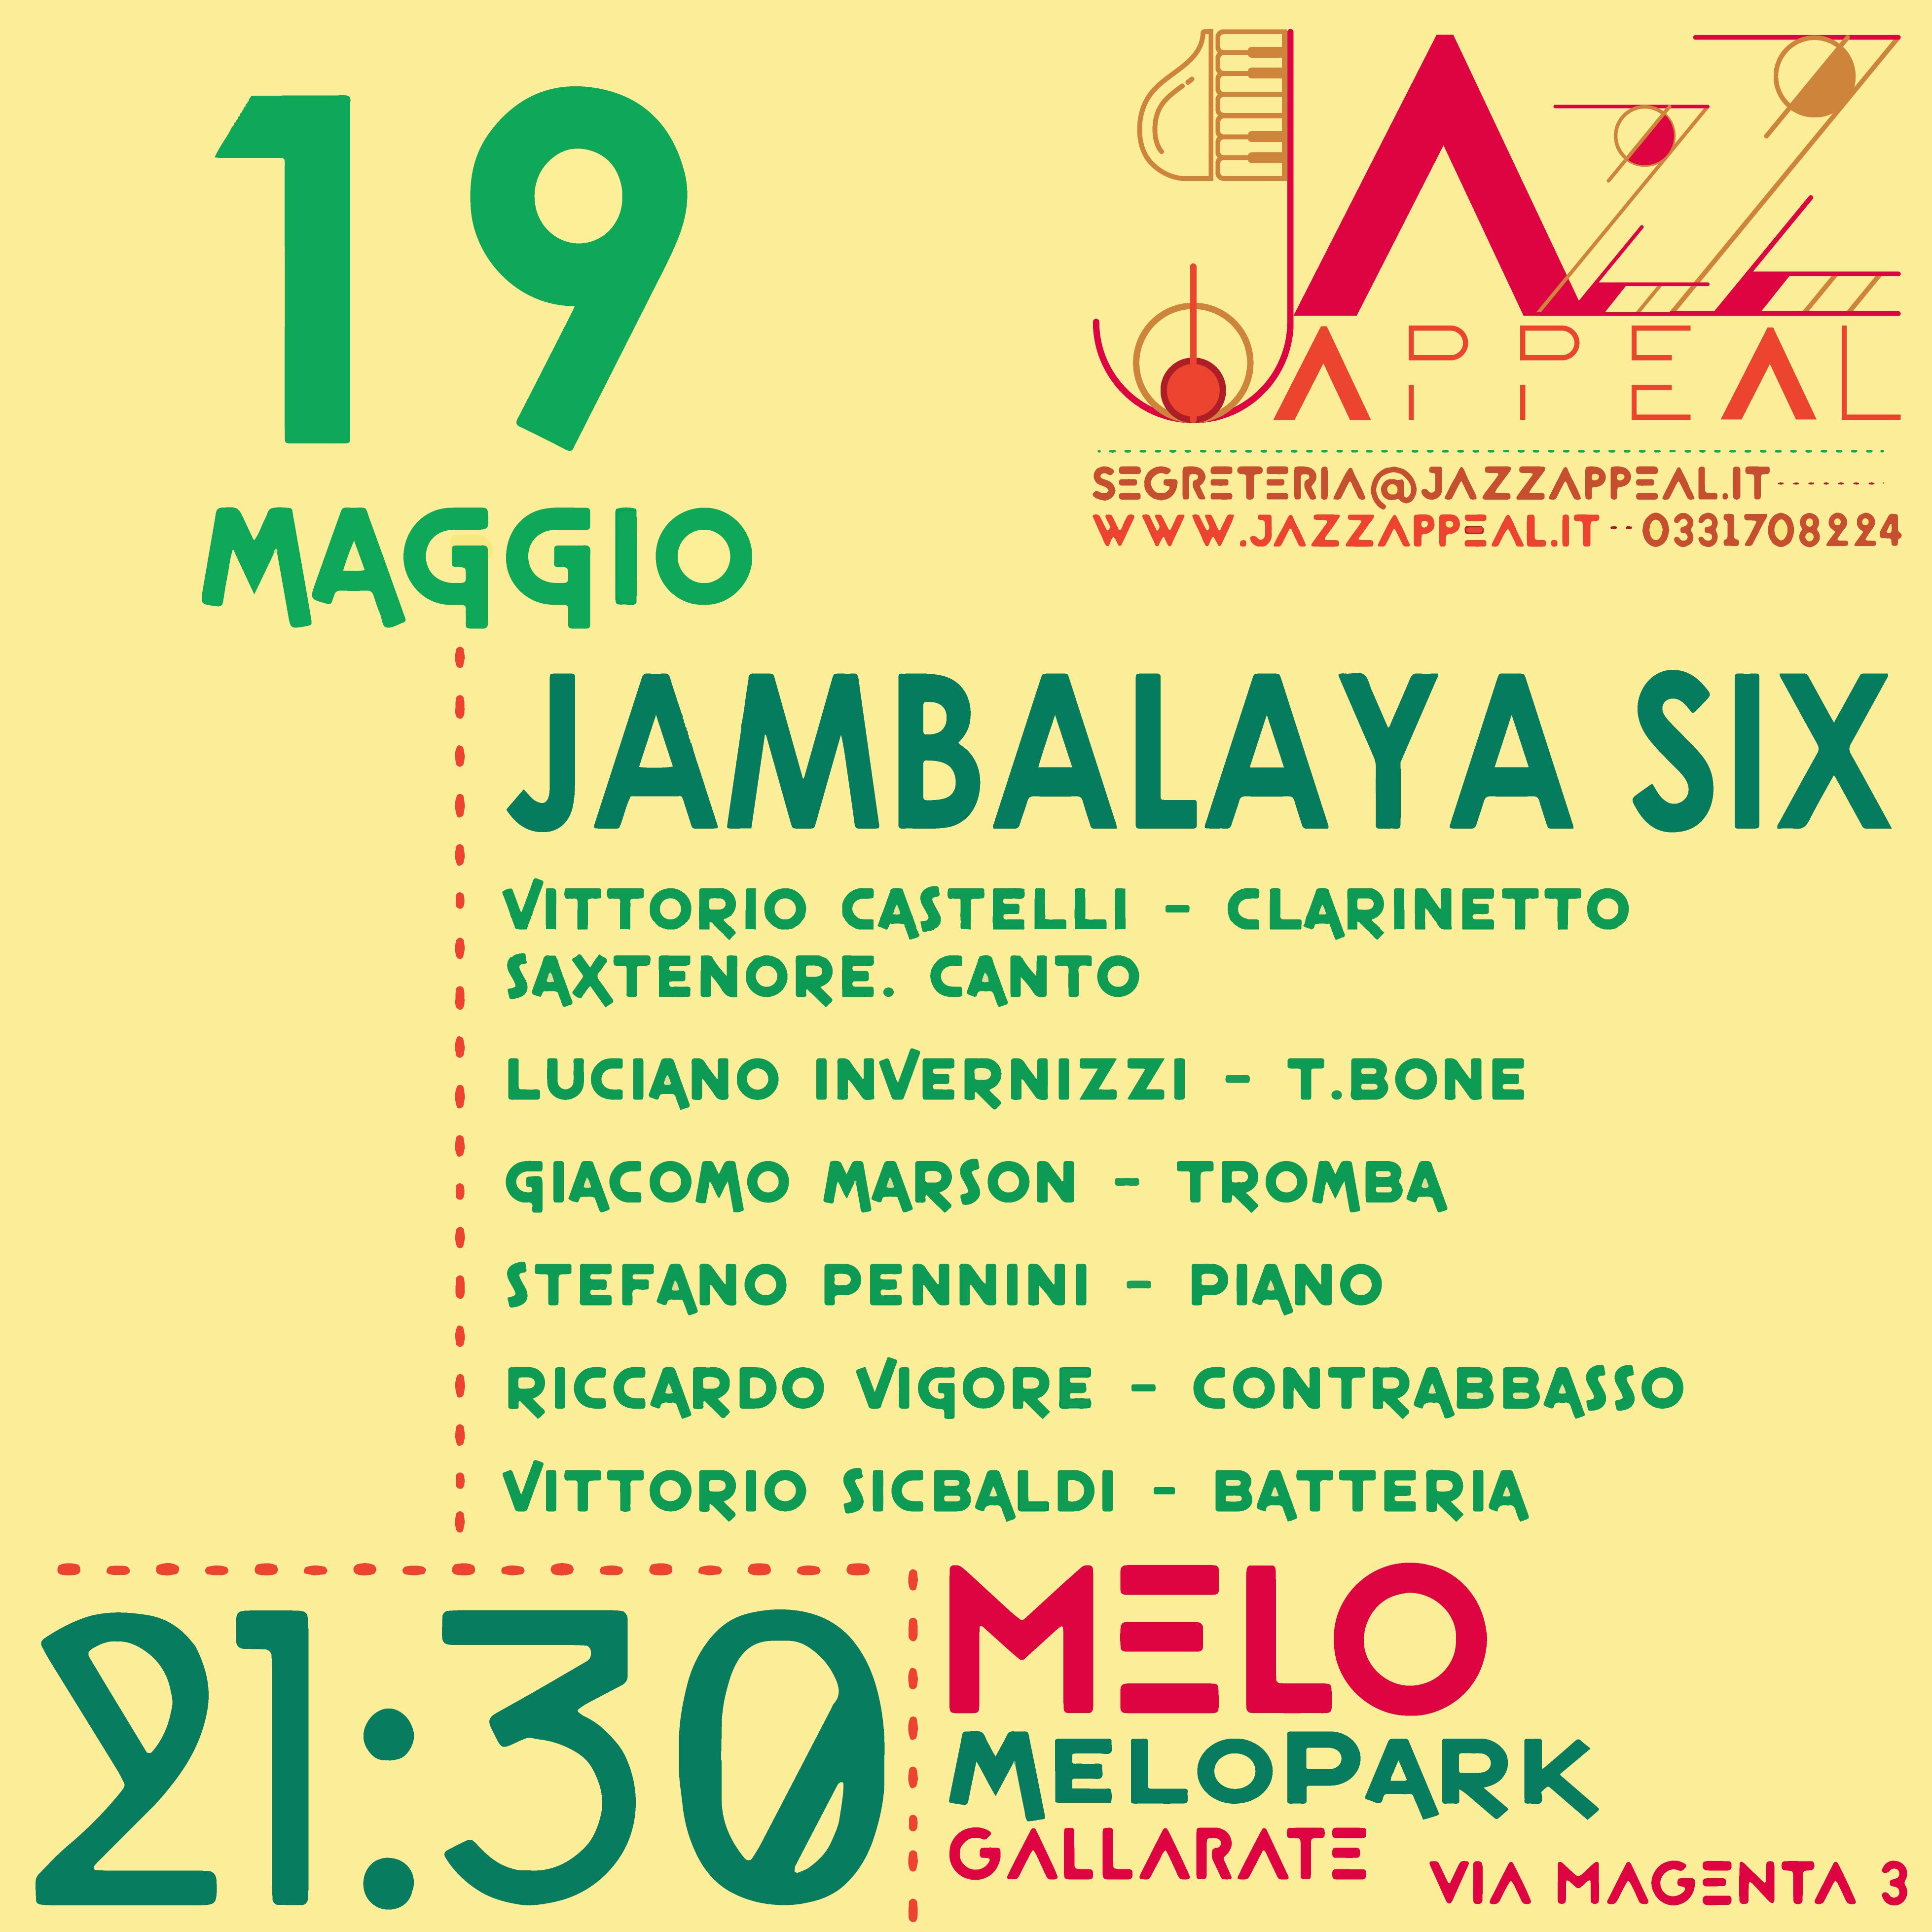 Jambalaya Six Jazz Appeal Gallarate Maggio